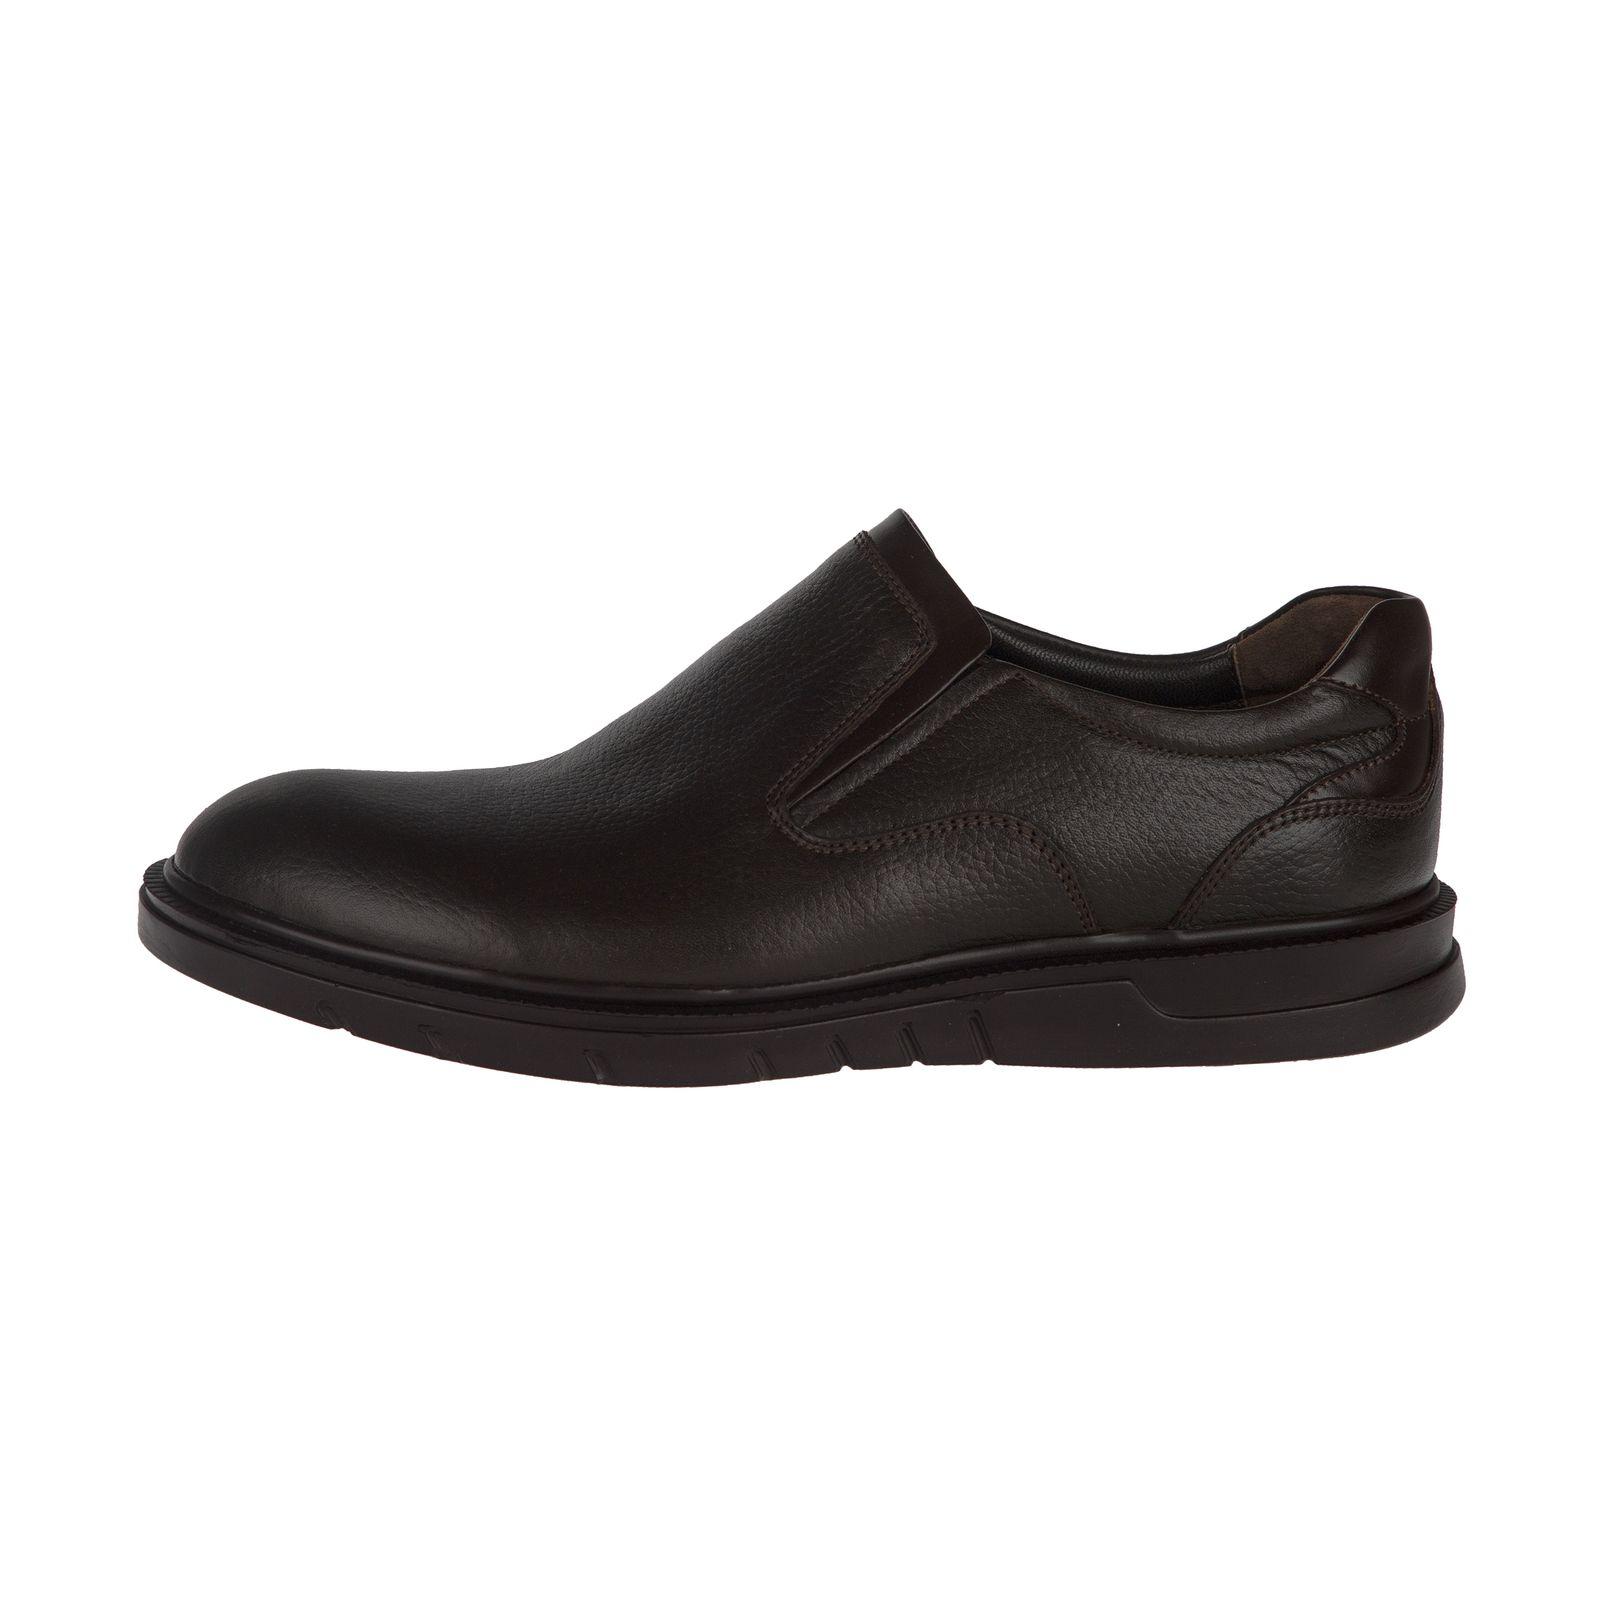 کفش روزمره مردانه بلوط مدل 7240C503104 -  - 2